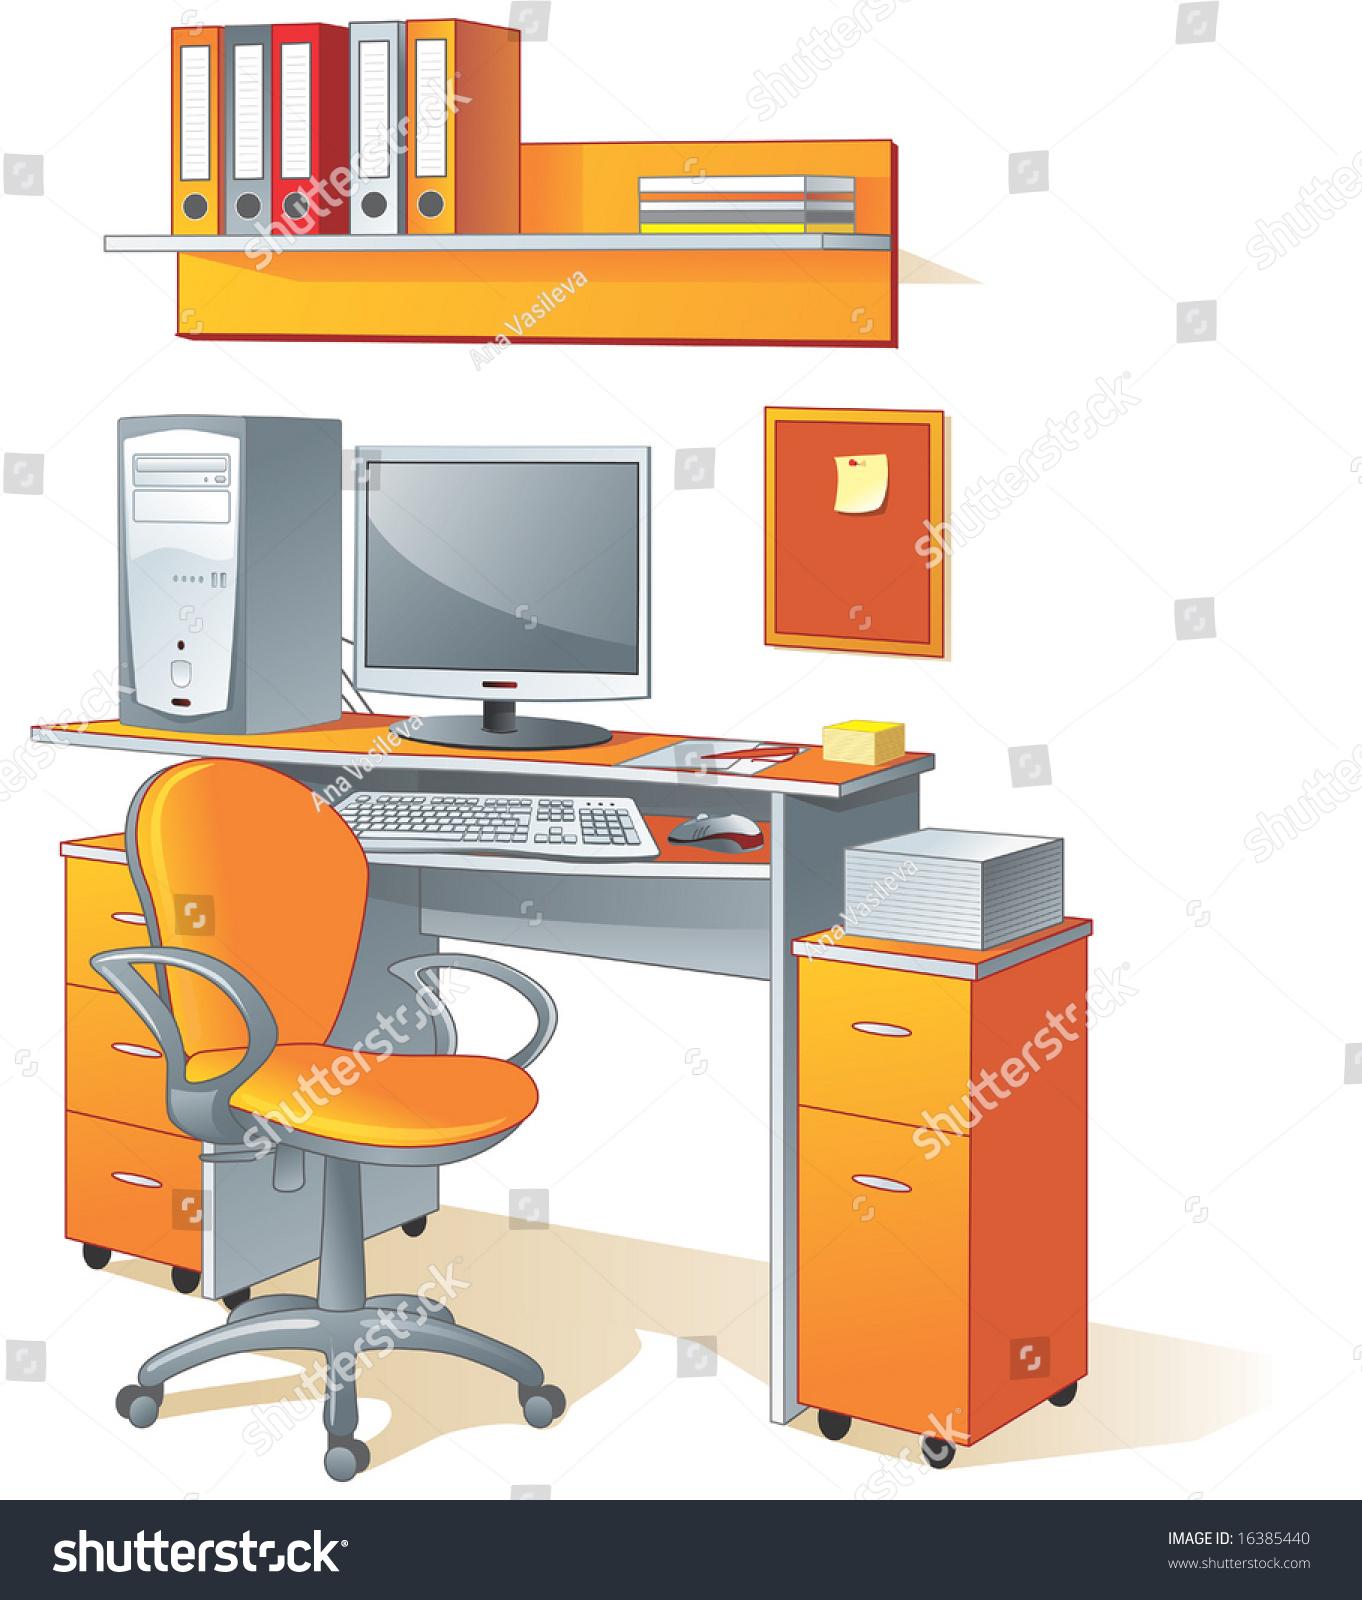 Desk computer chair files office furniture stock for Innenraumdesign studieren